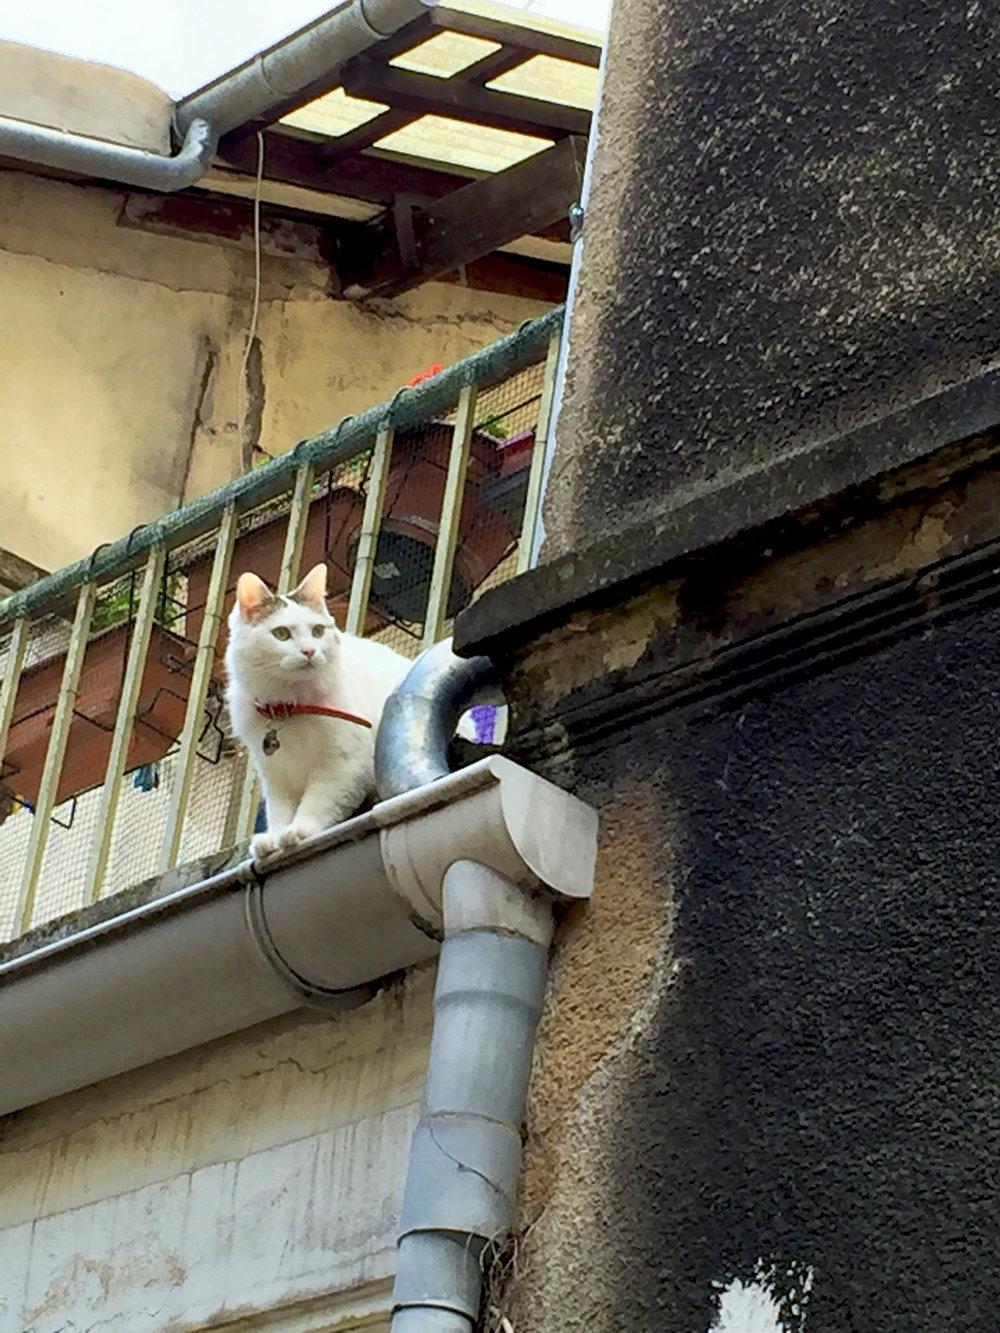 Chat de gouttière? Well, he/she is standing on a rain gutter... Rue des Thermopyles, 14th arrondissement